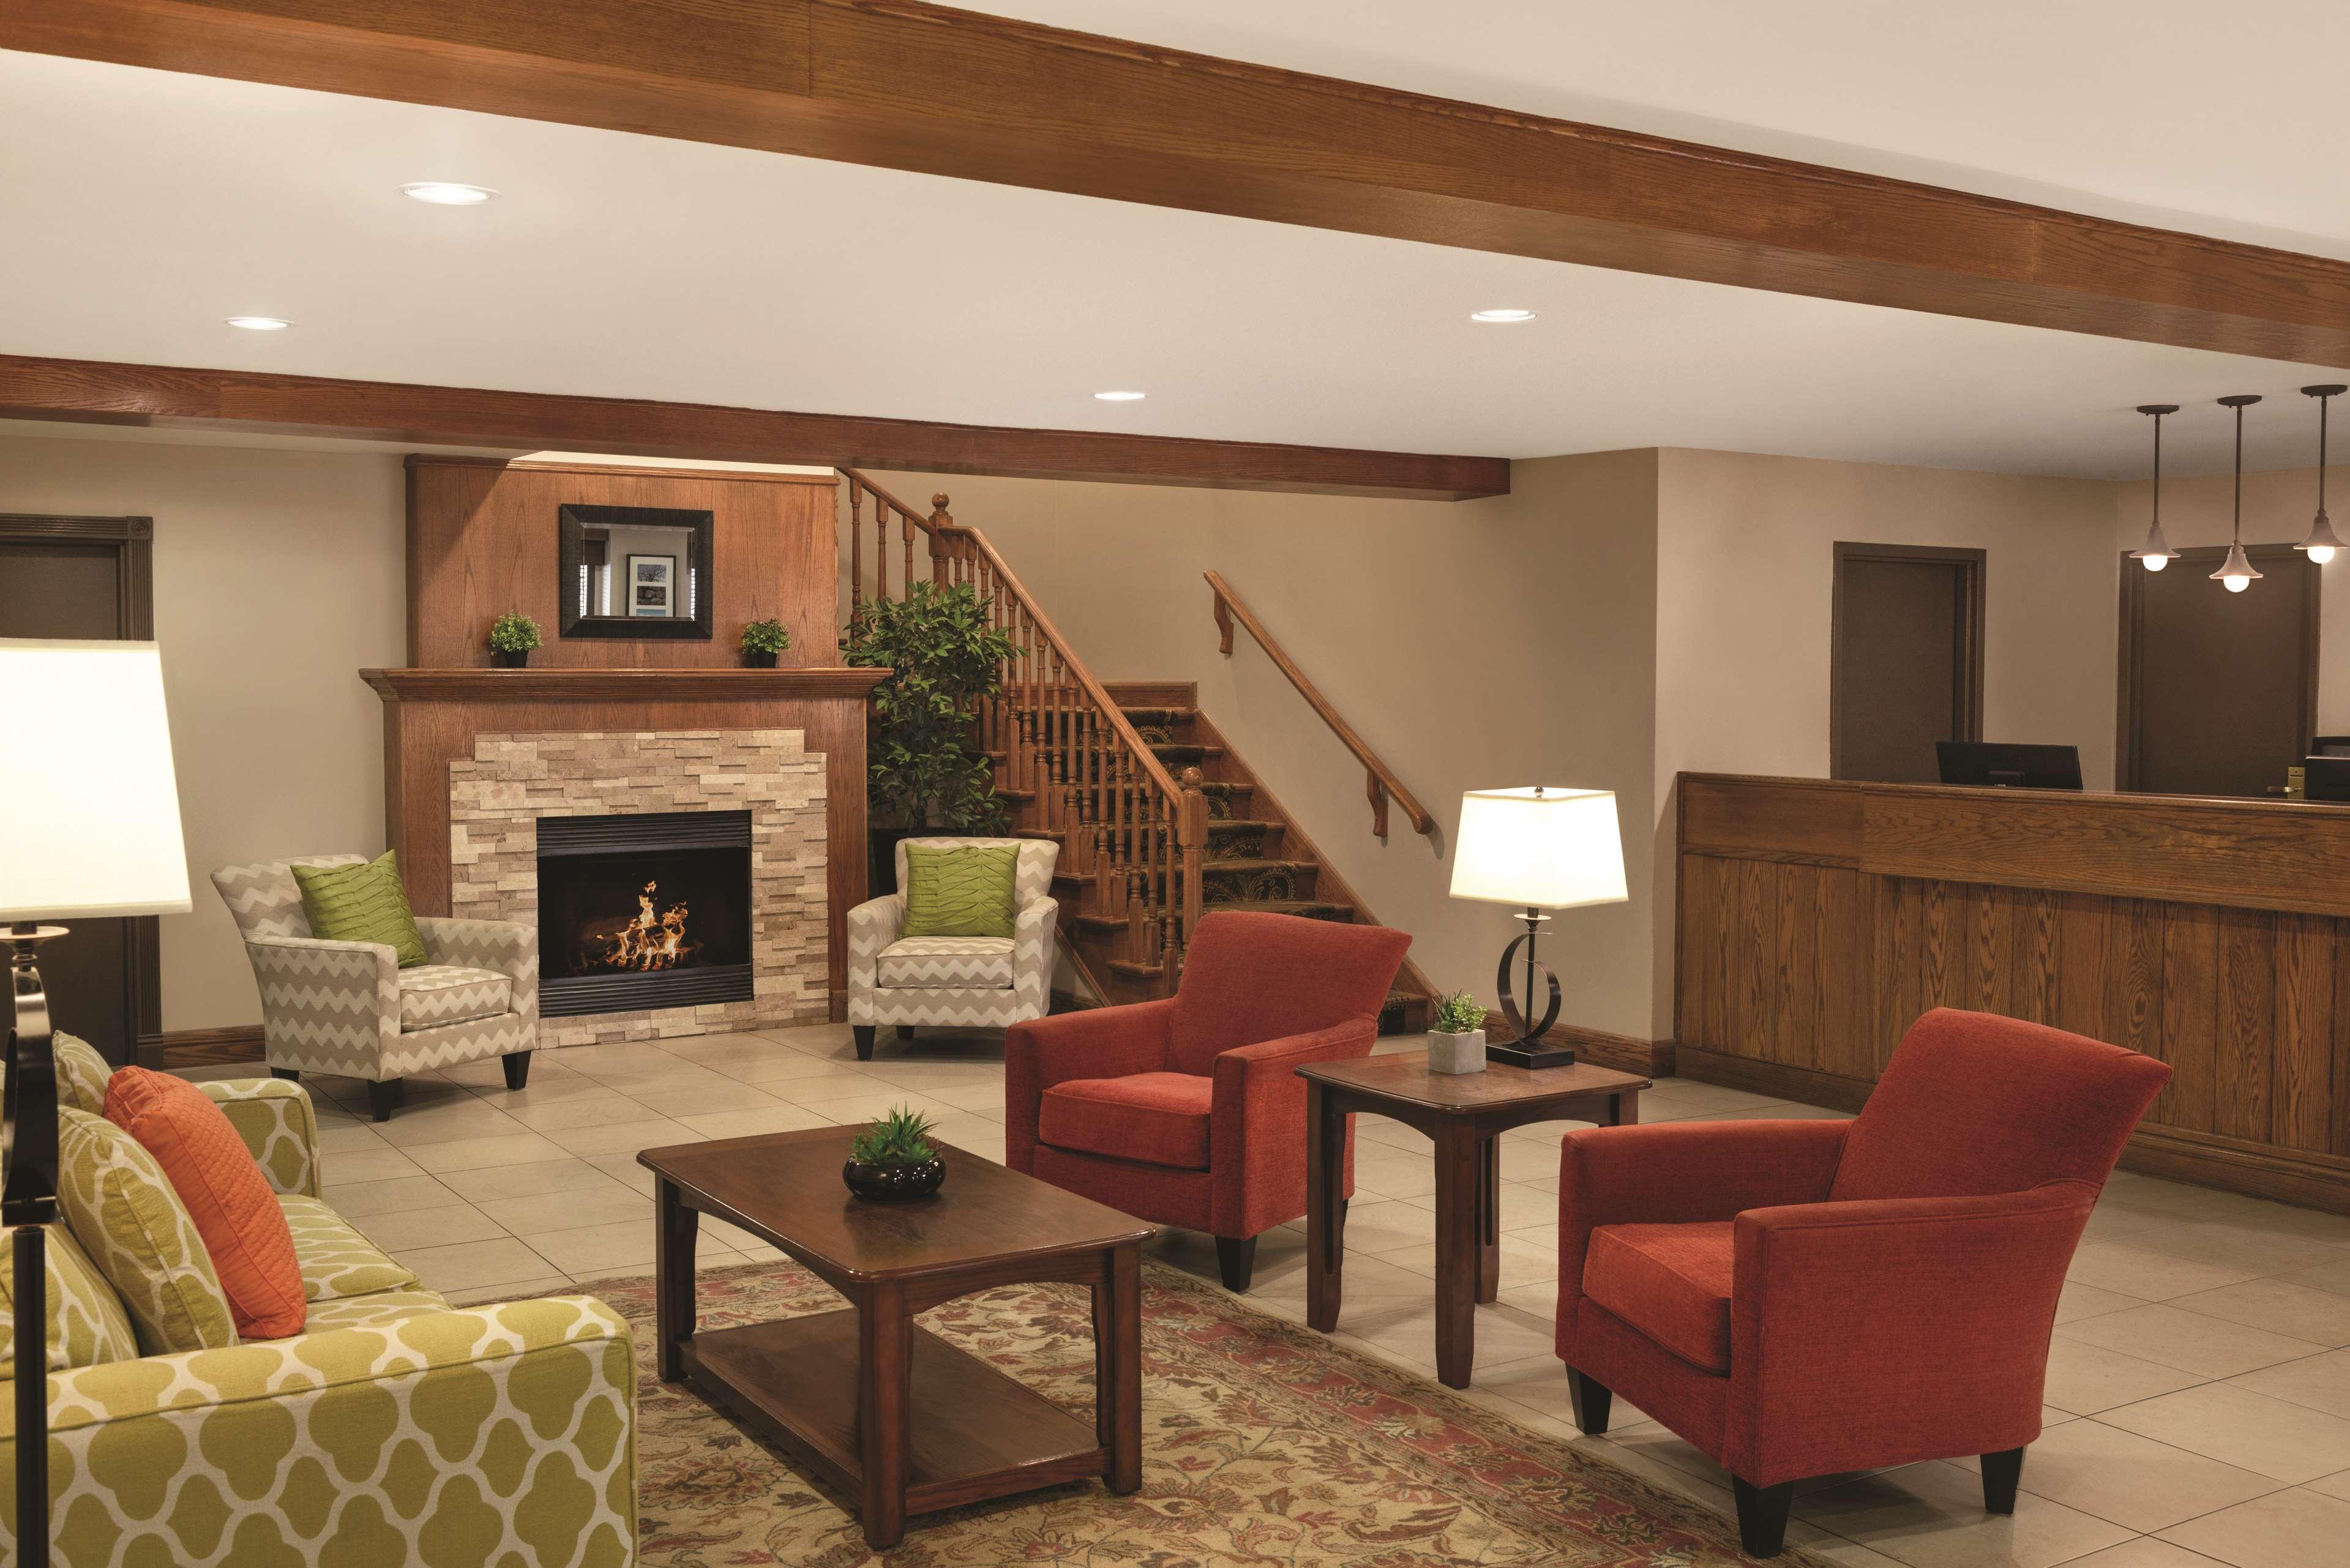 Country Inn & Suites by Radisson, Saskatoon, SK in Saskatoon: Lobby